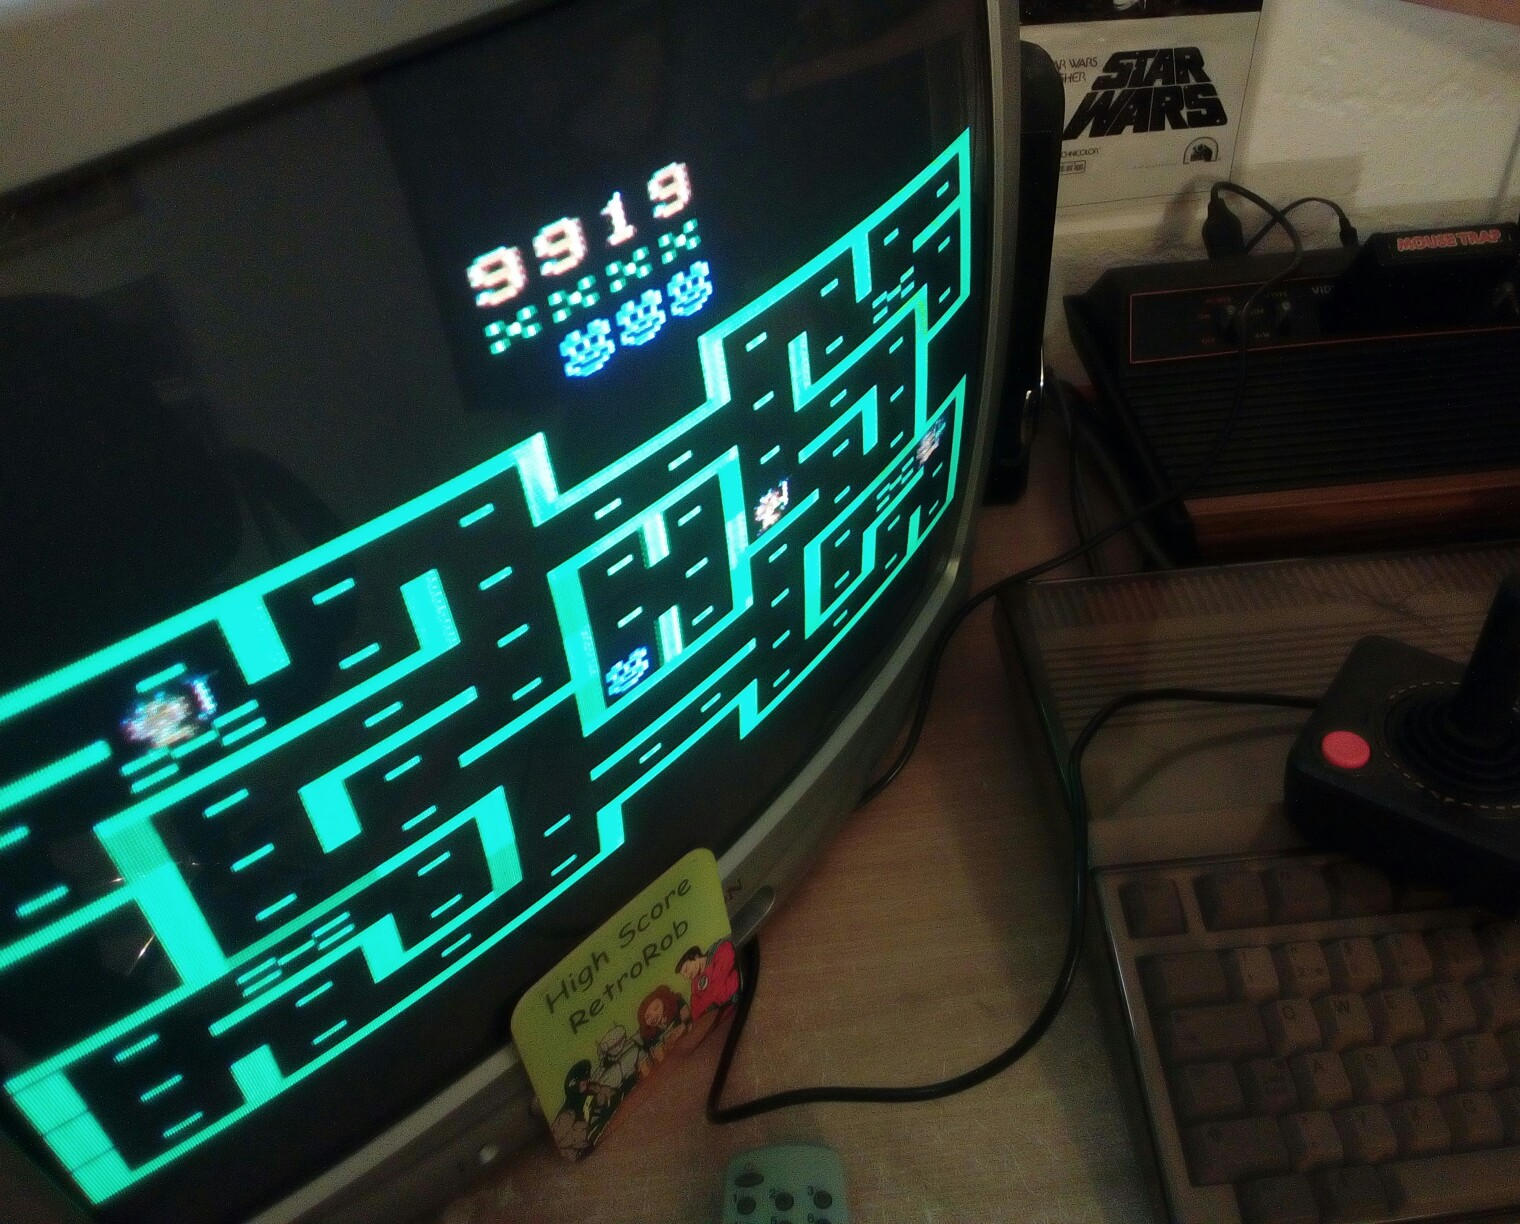 RetroRob: Mouse Trap (Atari 2600 Novice/B) 9,919 points on 2018-03-19 15:22:10